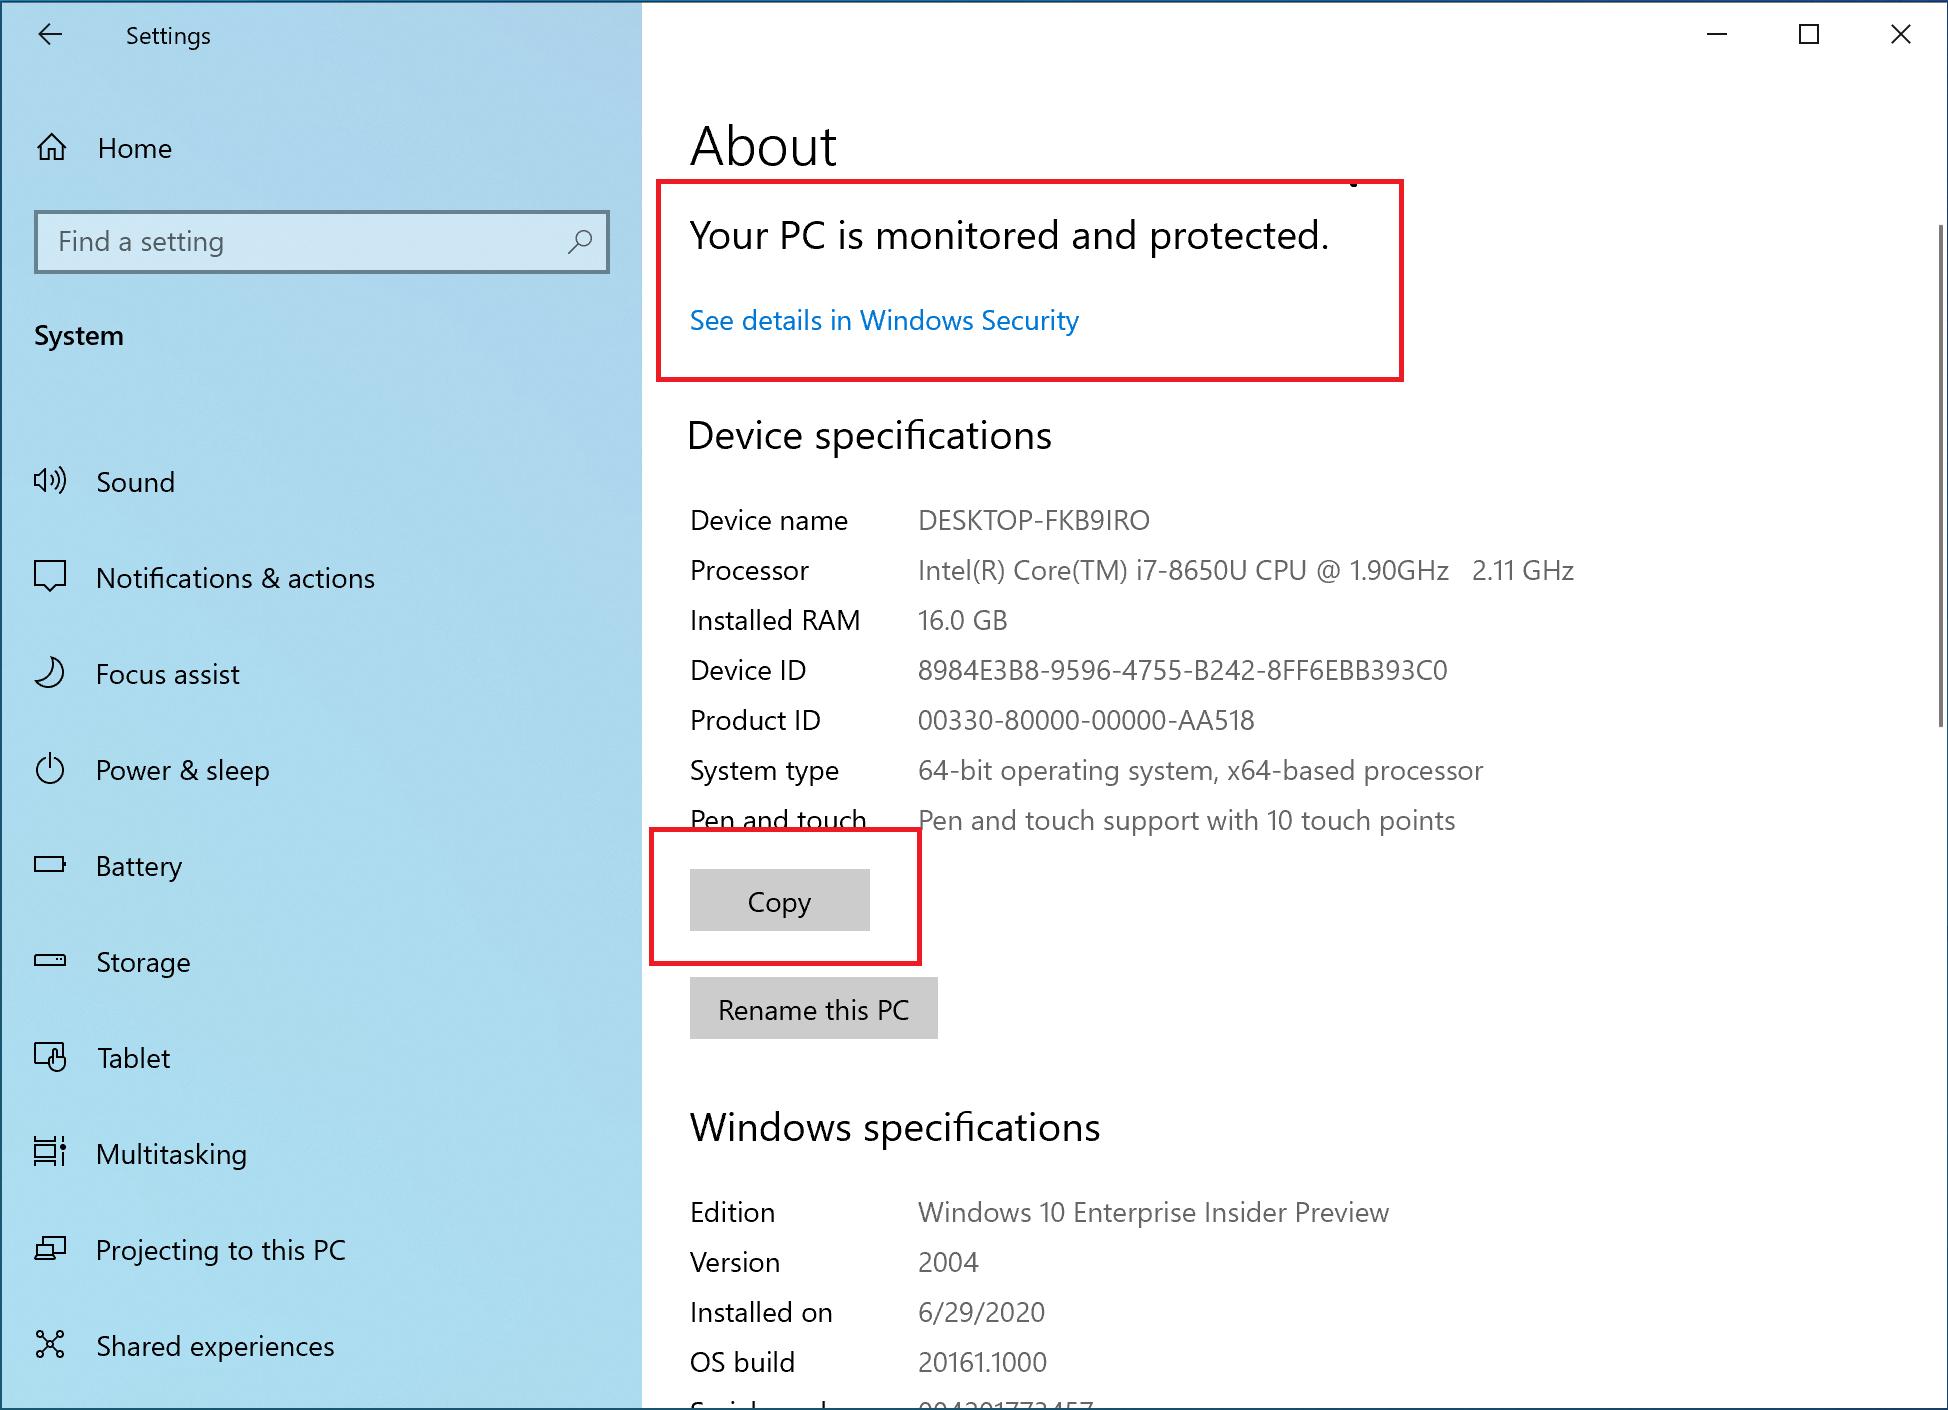 Windows 10 Insider Preview Build 20161.1000 (rs_prerelease) - July 1 329ddd5b6ac1257e88fbc73d79d9e7a9.png